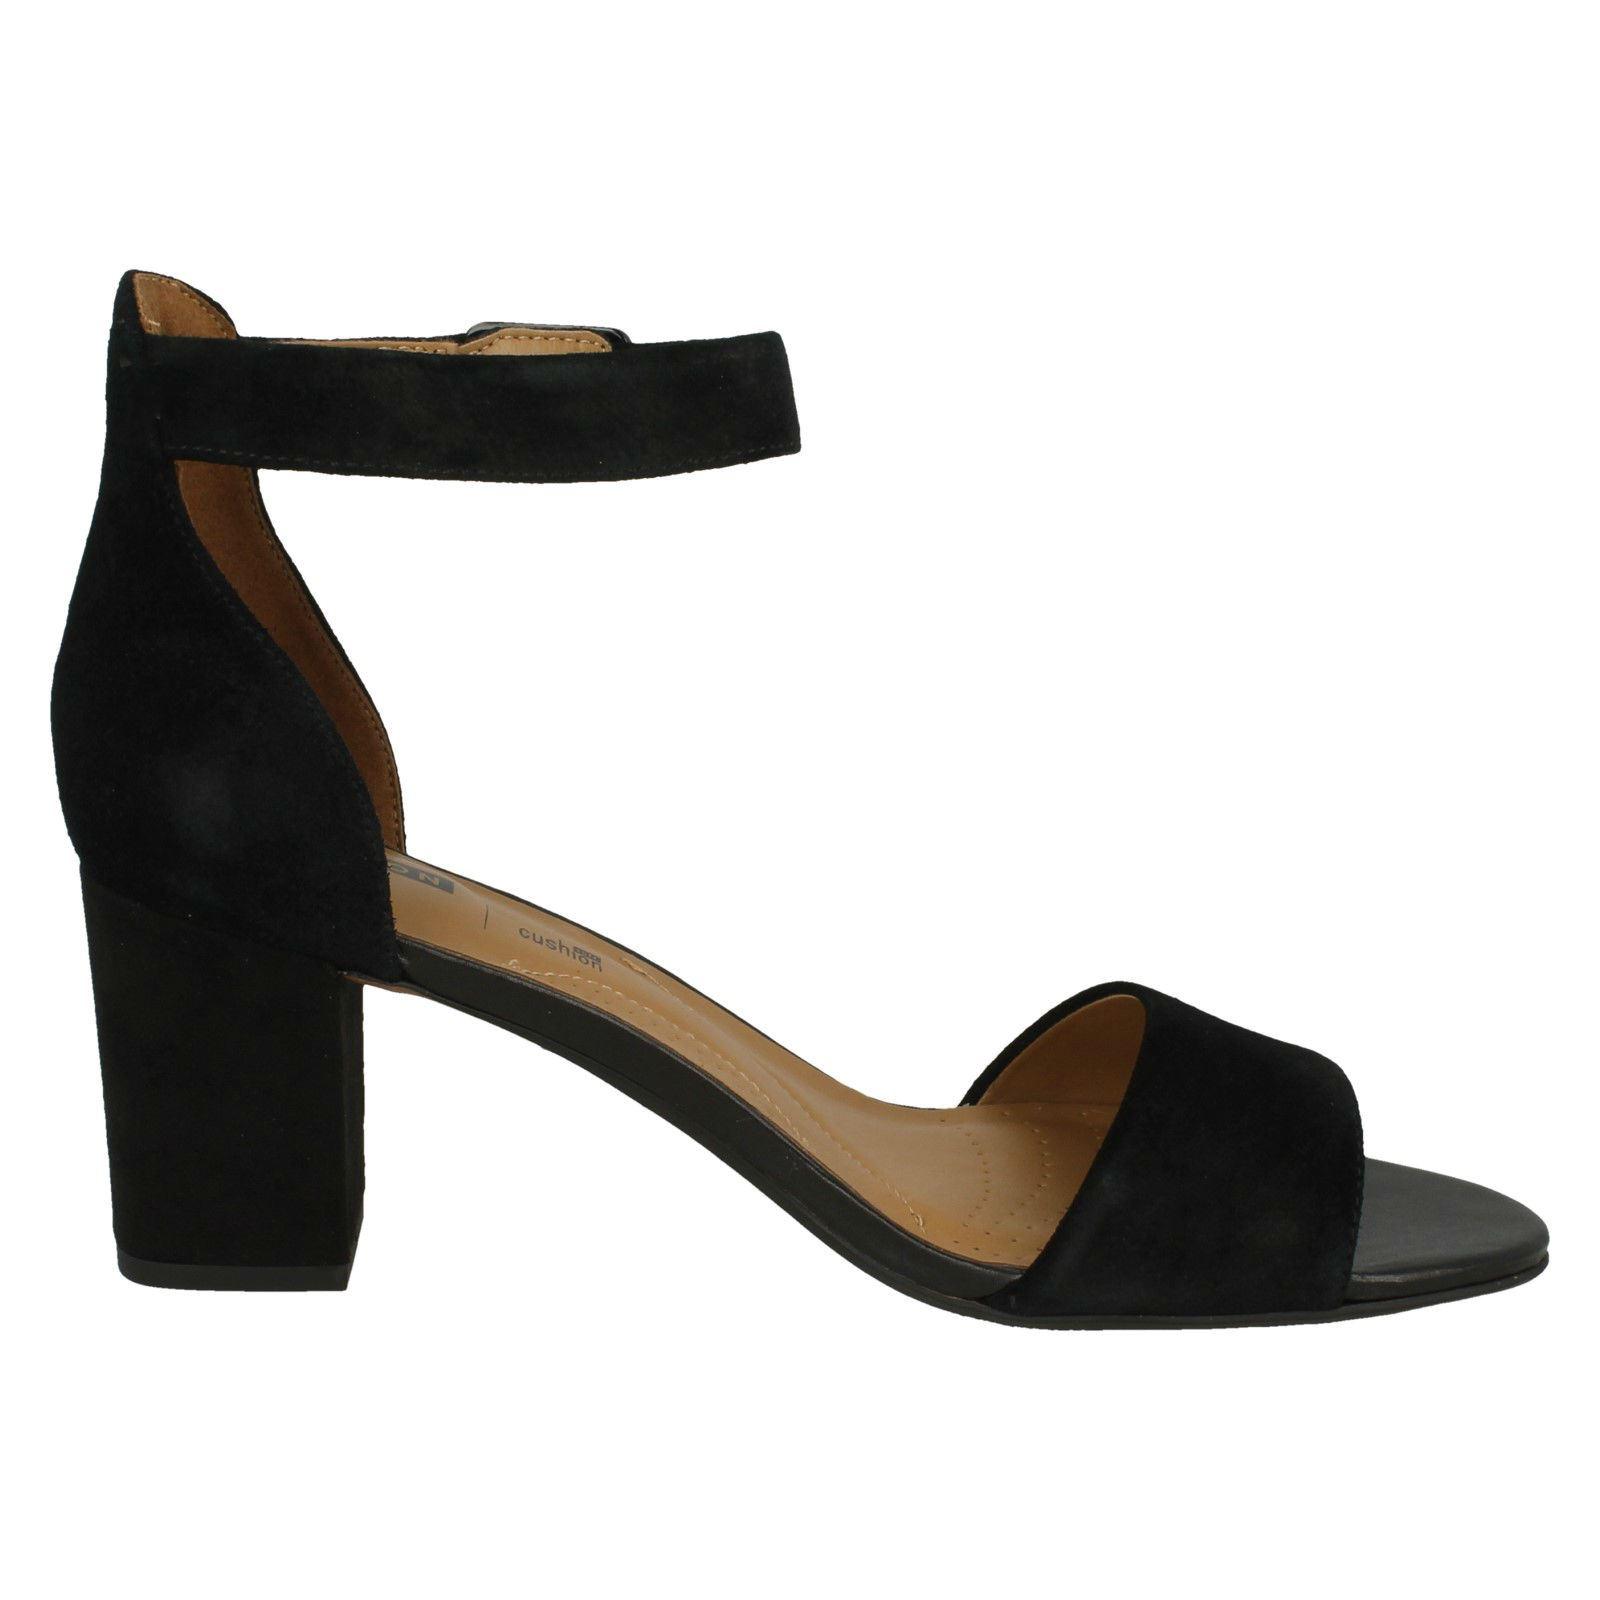 40affa22e10 Ladies-Clarks-Heeled-Sandals-Deva-Mae thumbnail 7